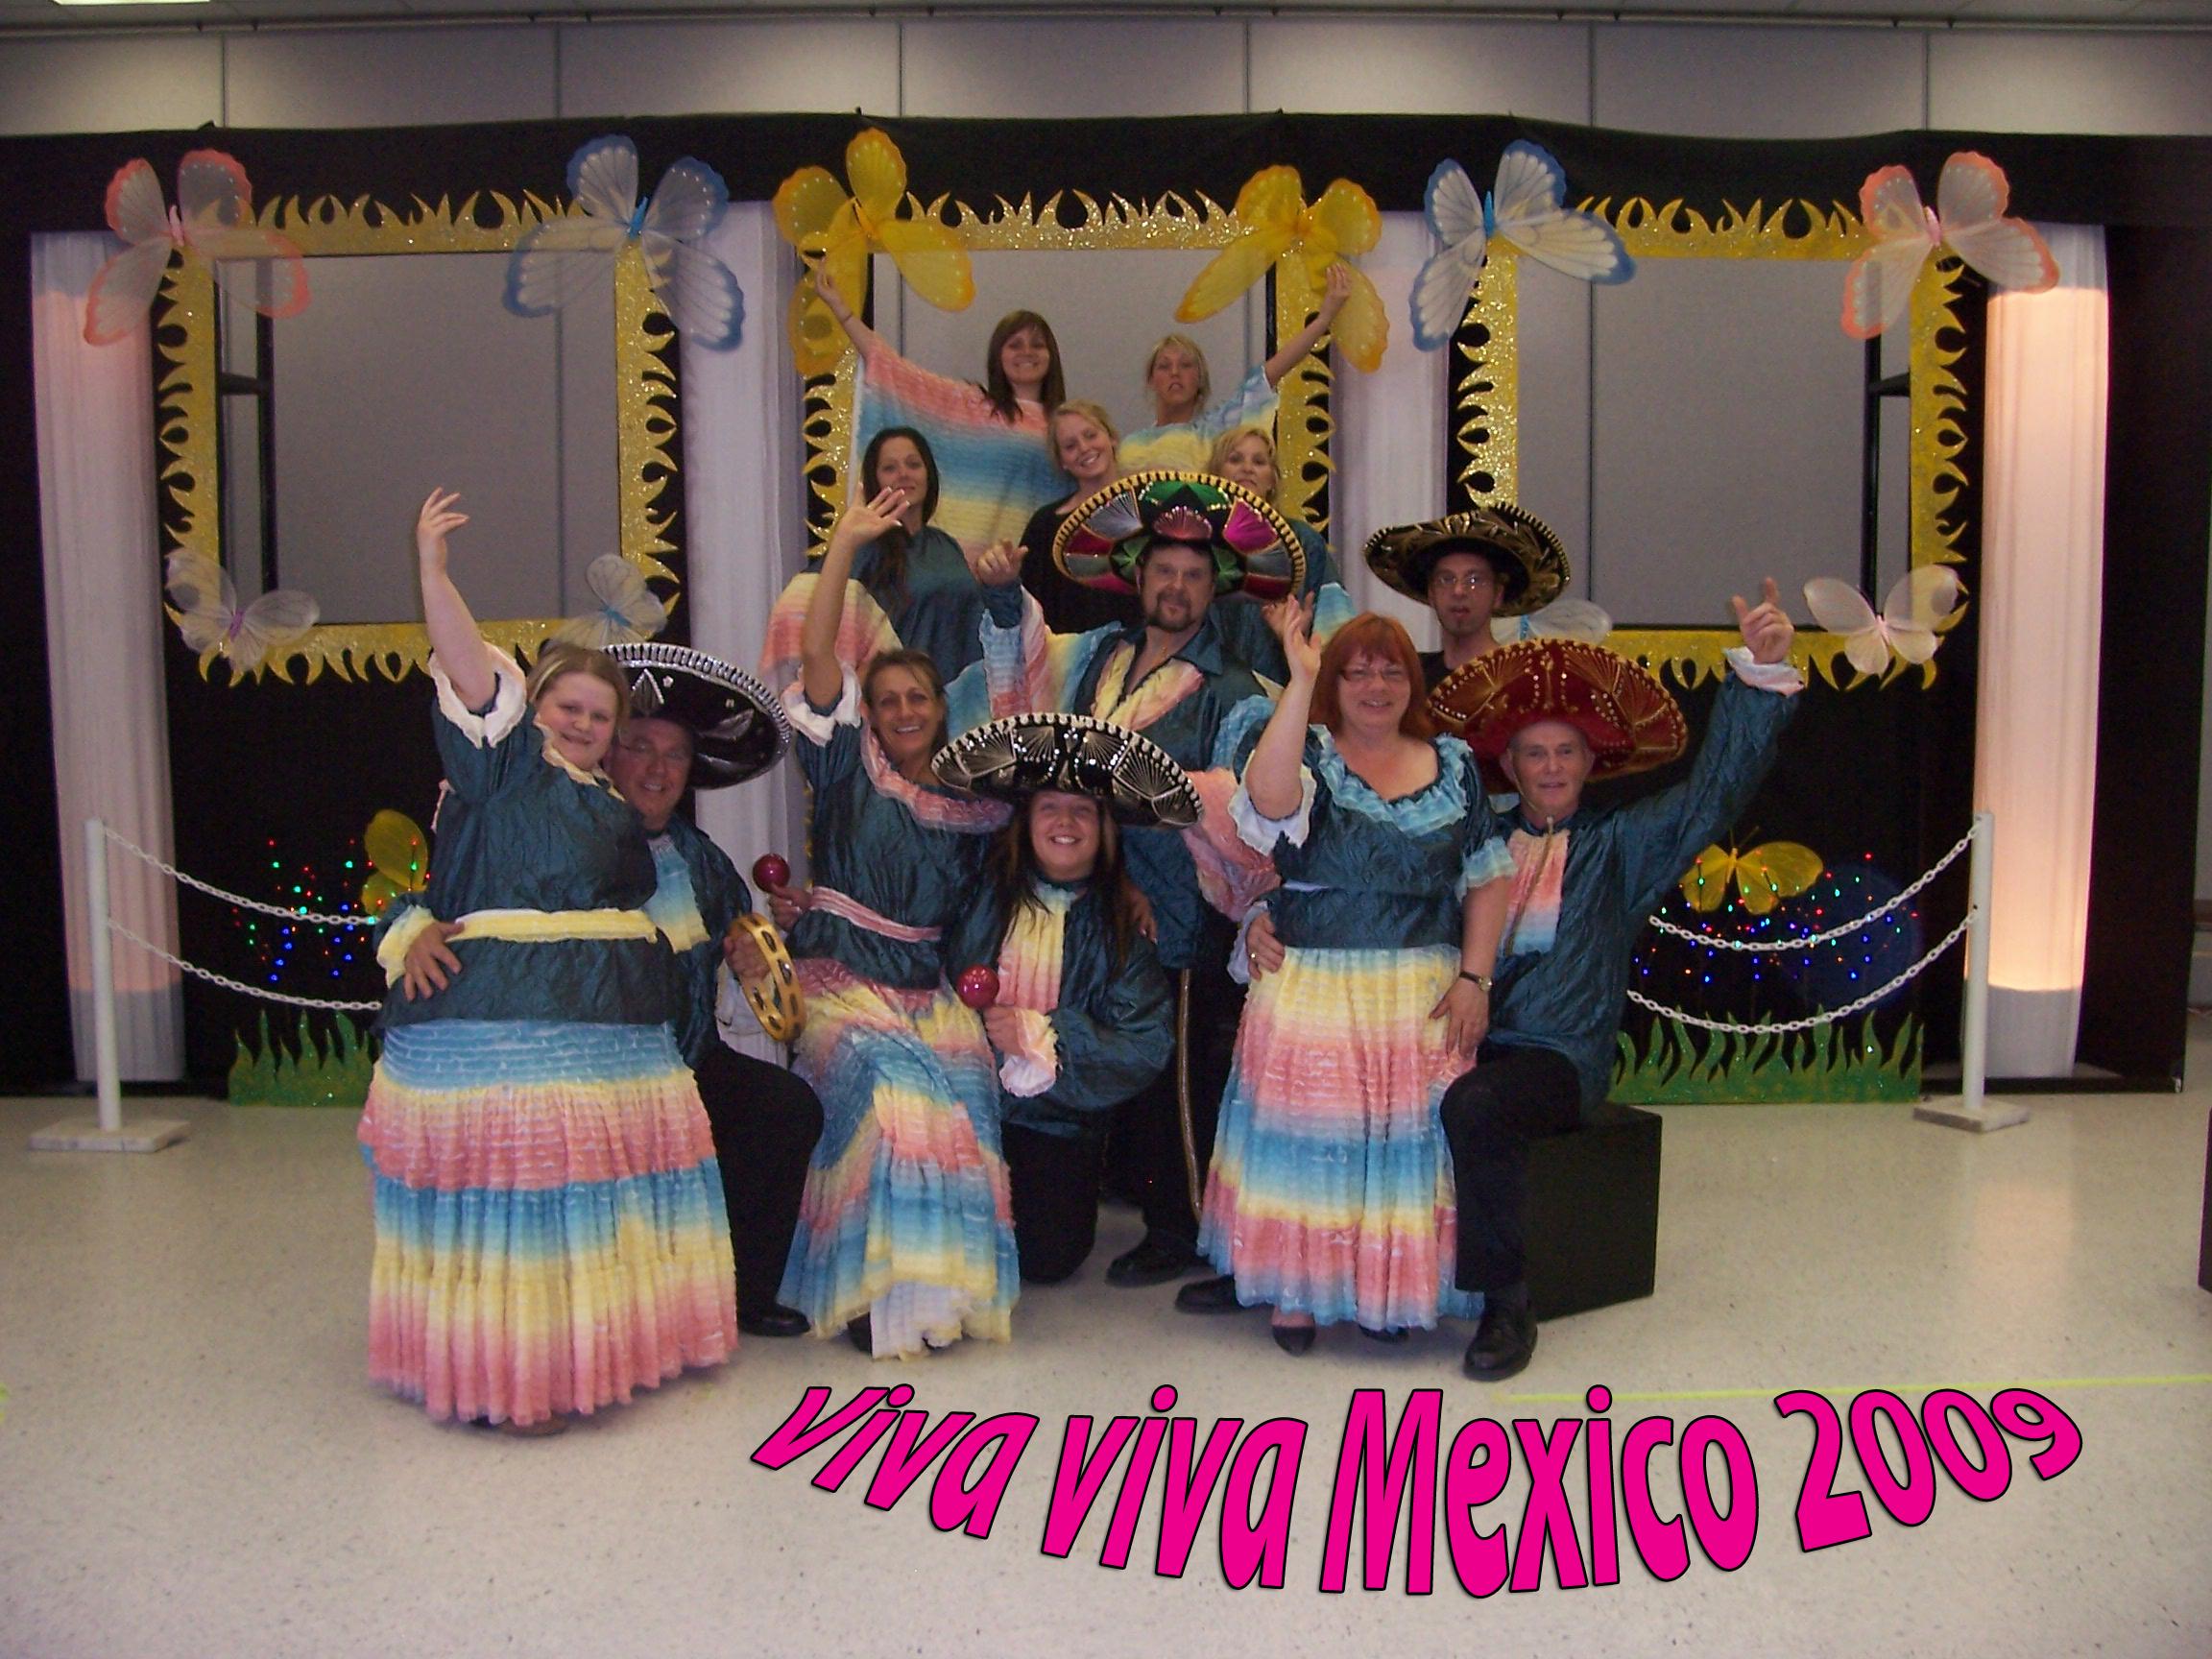 Viva Mexico 2009